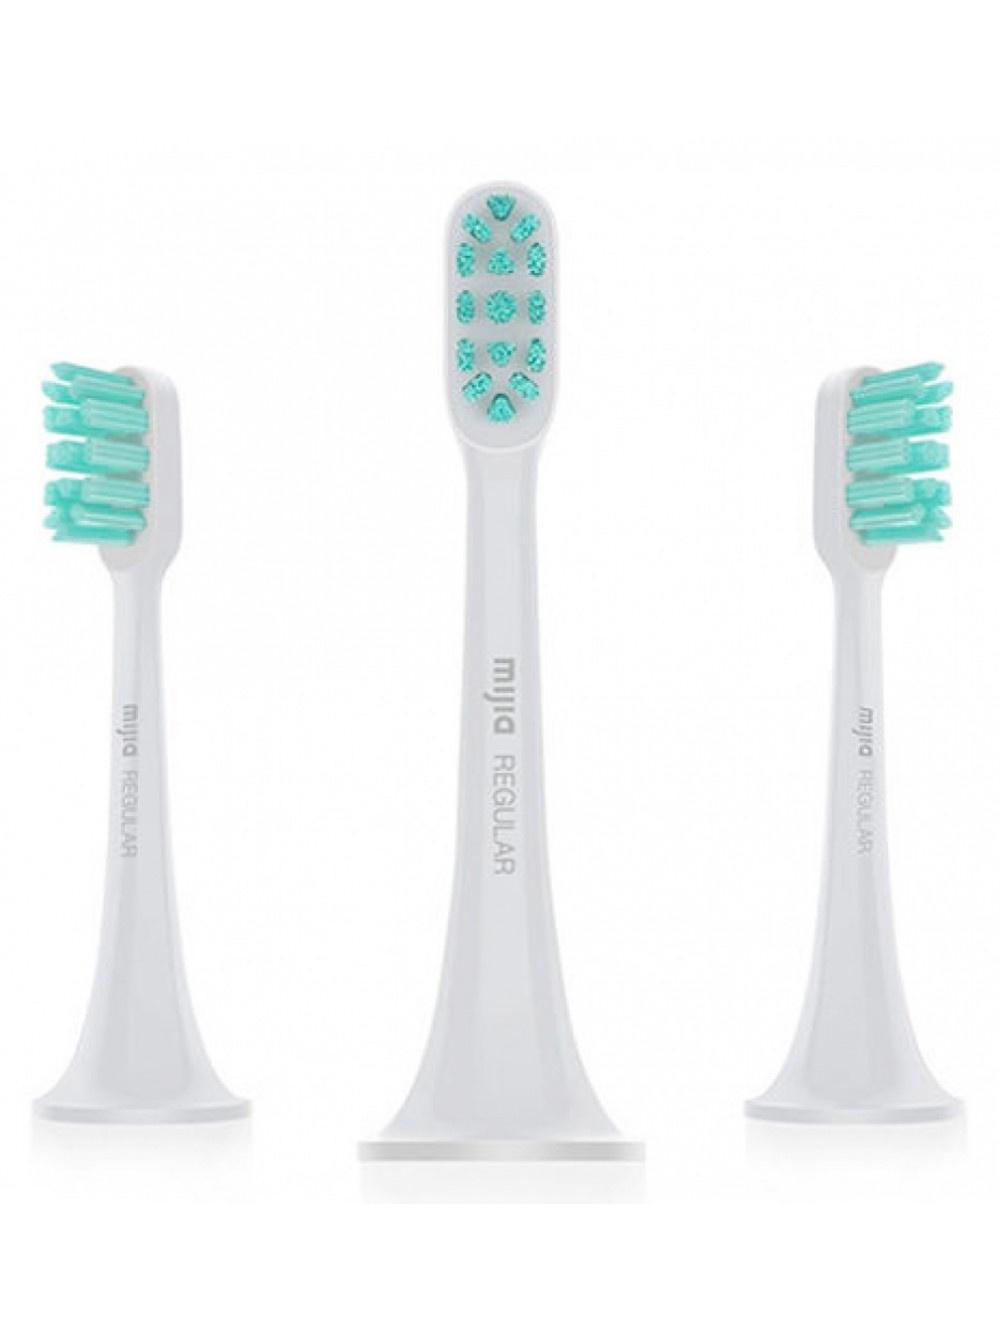 Сменные насадки для зубной щетки Xiaomi Sonic Electric Toothbrush 3шт crystal care plus professional sonic toothbrush with uv sanitizer white